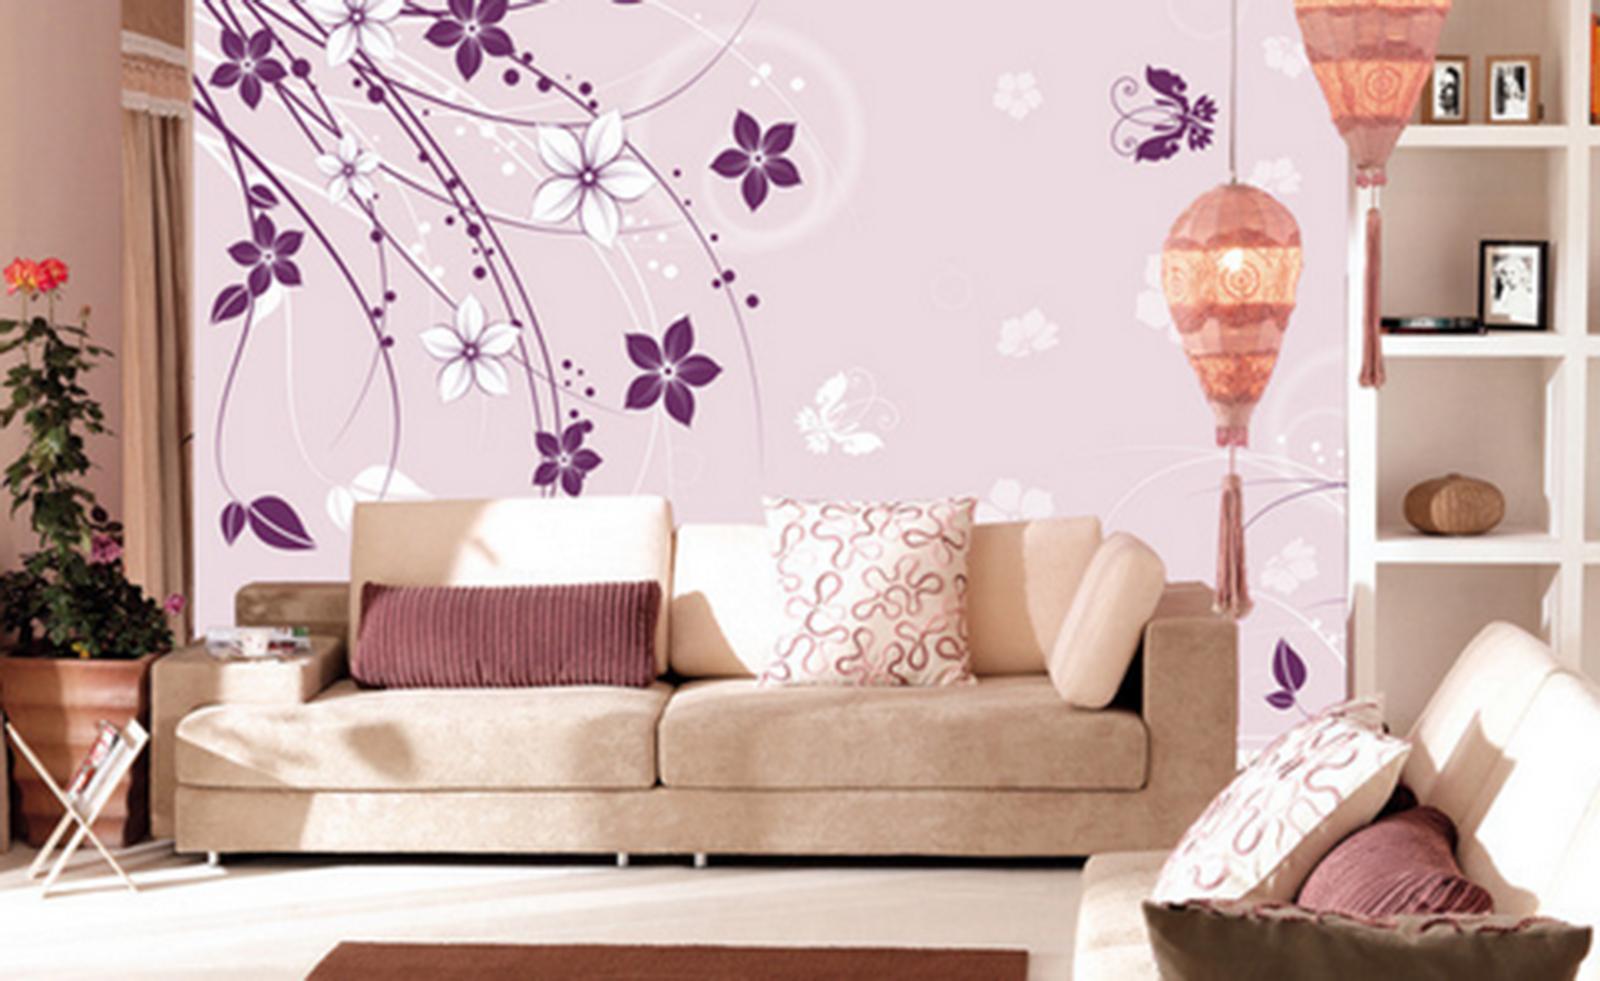 3D Squid lila 6874 Wallpaper Murals Wall Print Wallpaper Mural AJ WALL UK Kyra